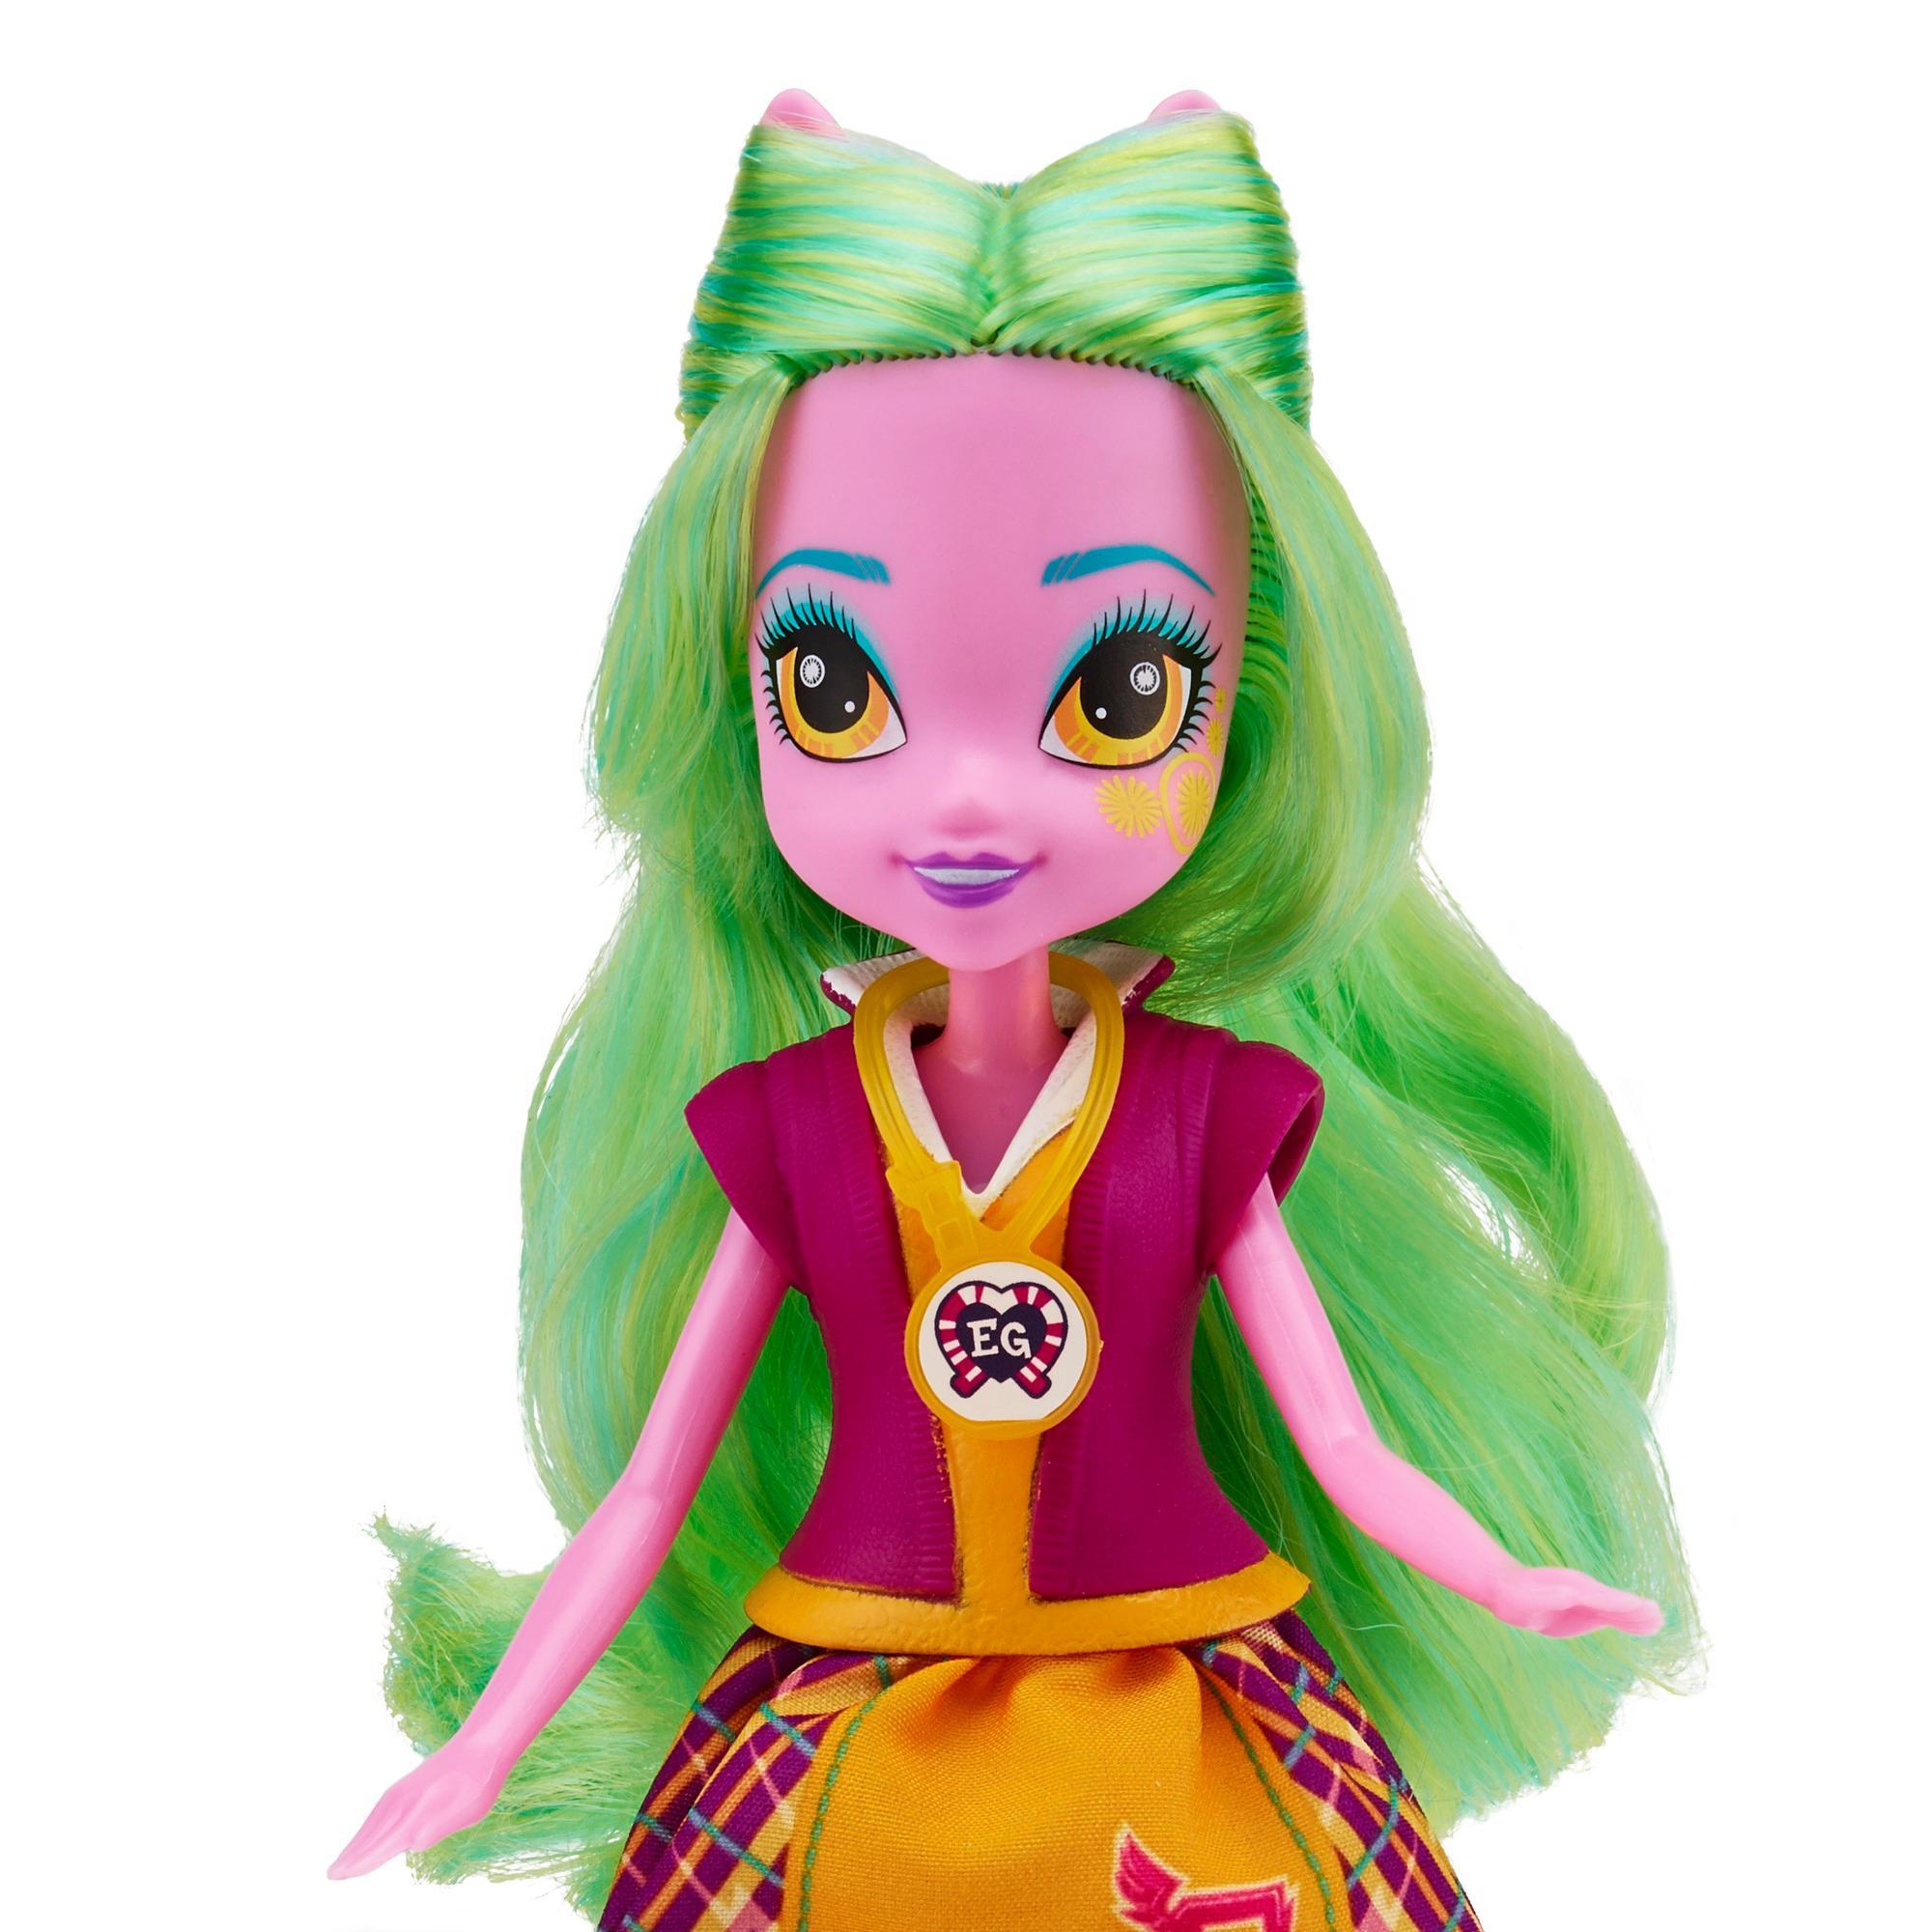 Amazon.com: My Little Pony Equestria Girls Lemon Zest